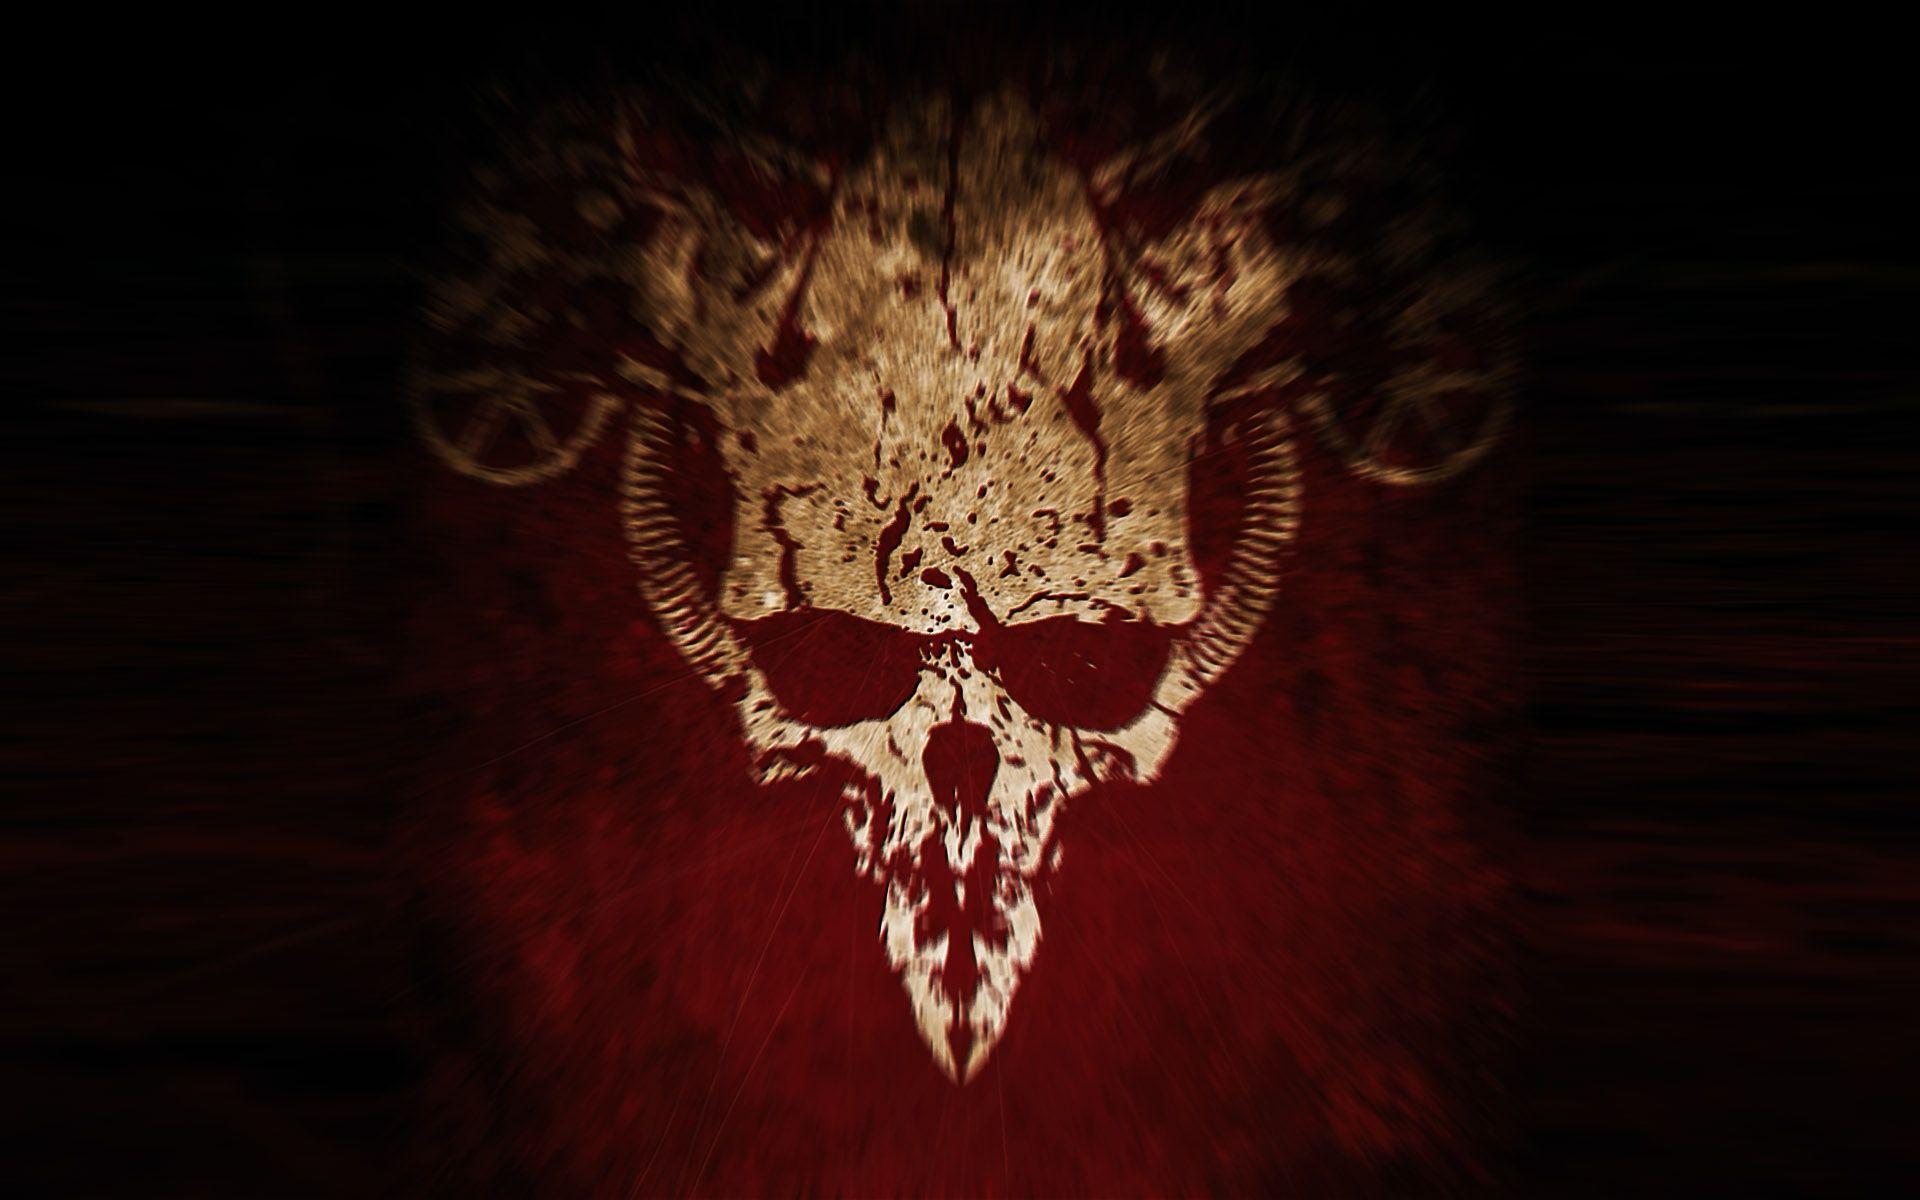 Devil skull wallpapers wallpaper cave - Demon wallpaper 4k ...